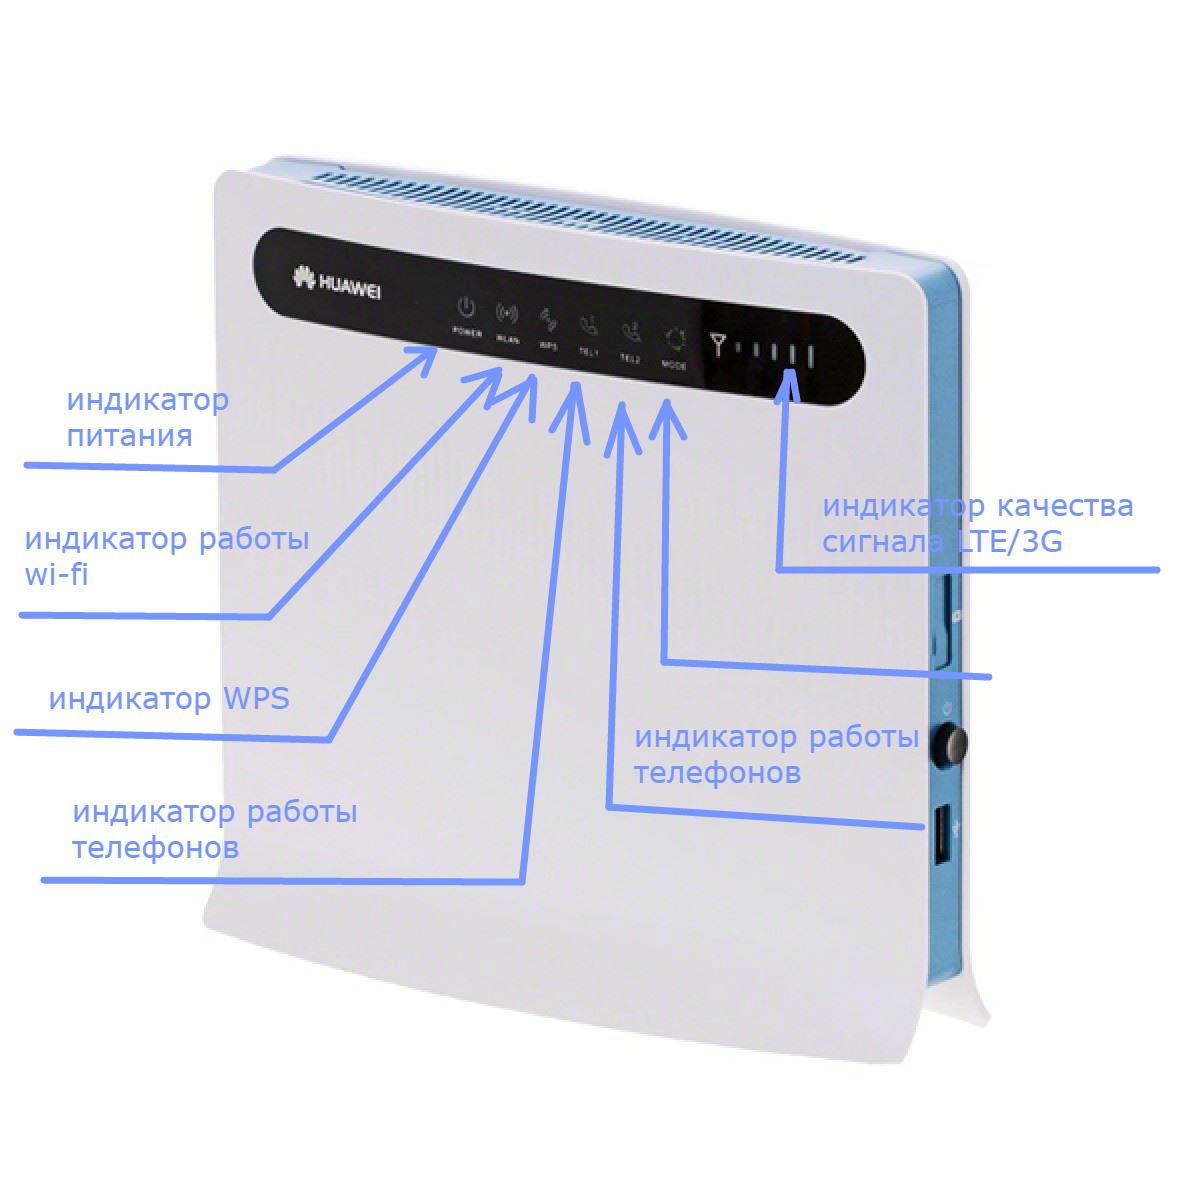 Wi-Fi 3G/4G роутер Huawei B593s - 22 box